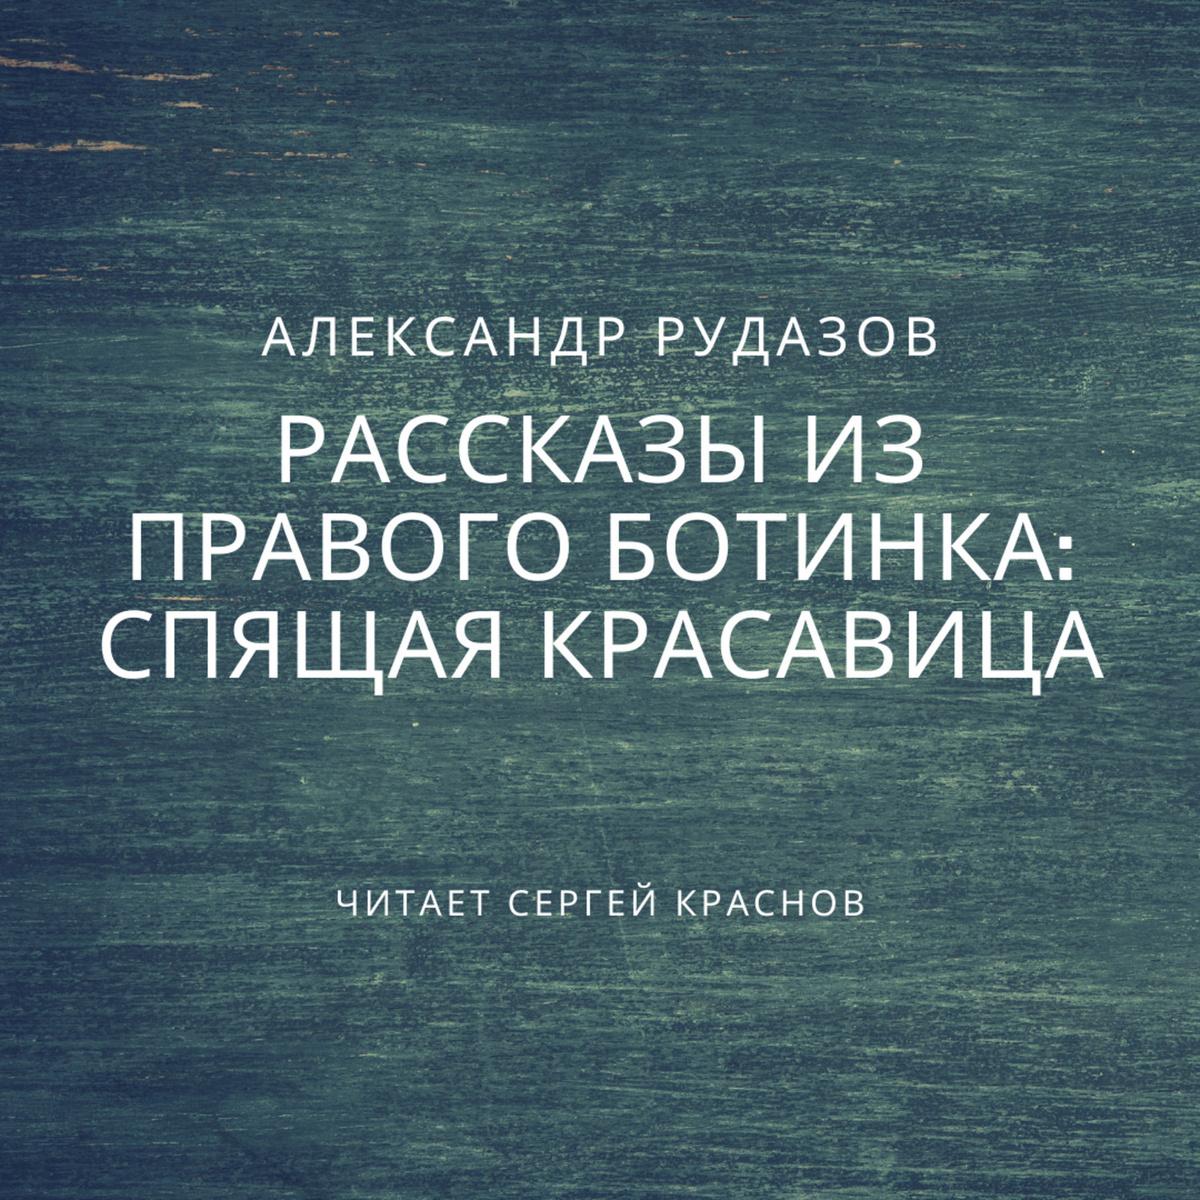 Спящая красавица   Рудазов Александр Валентинович #1